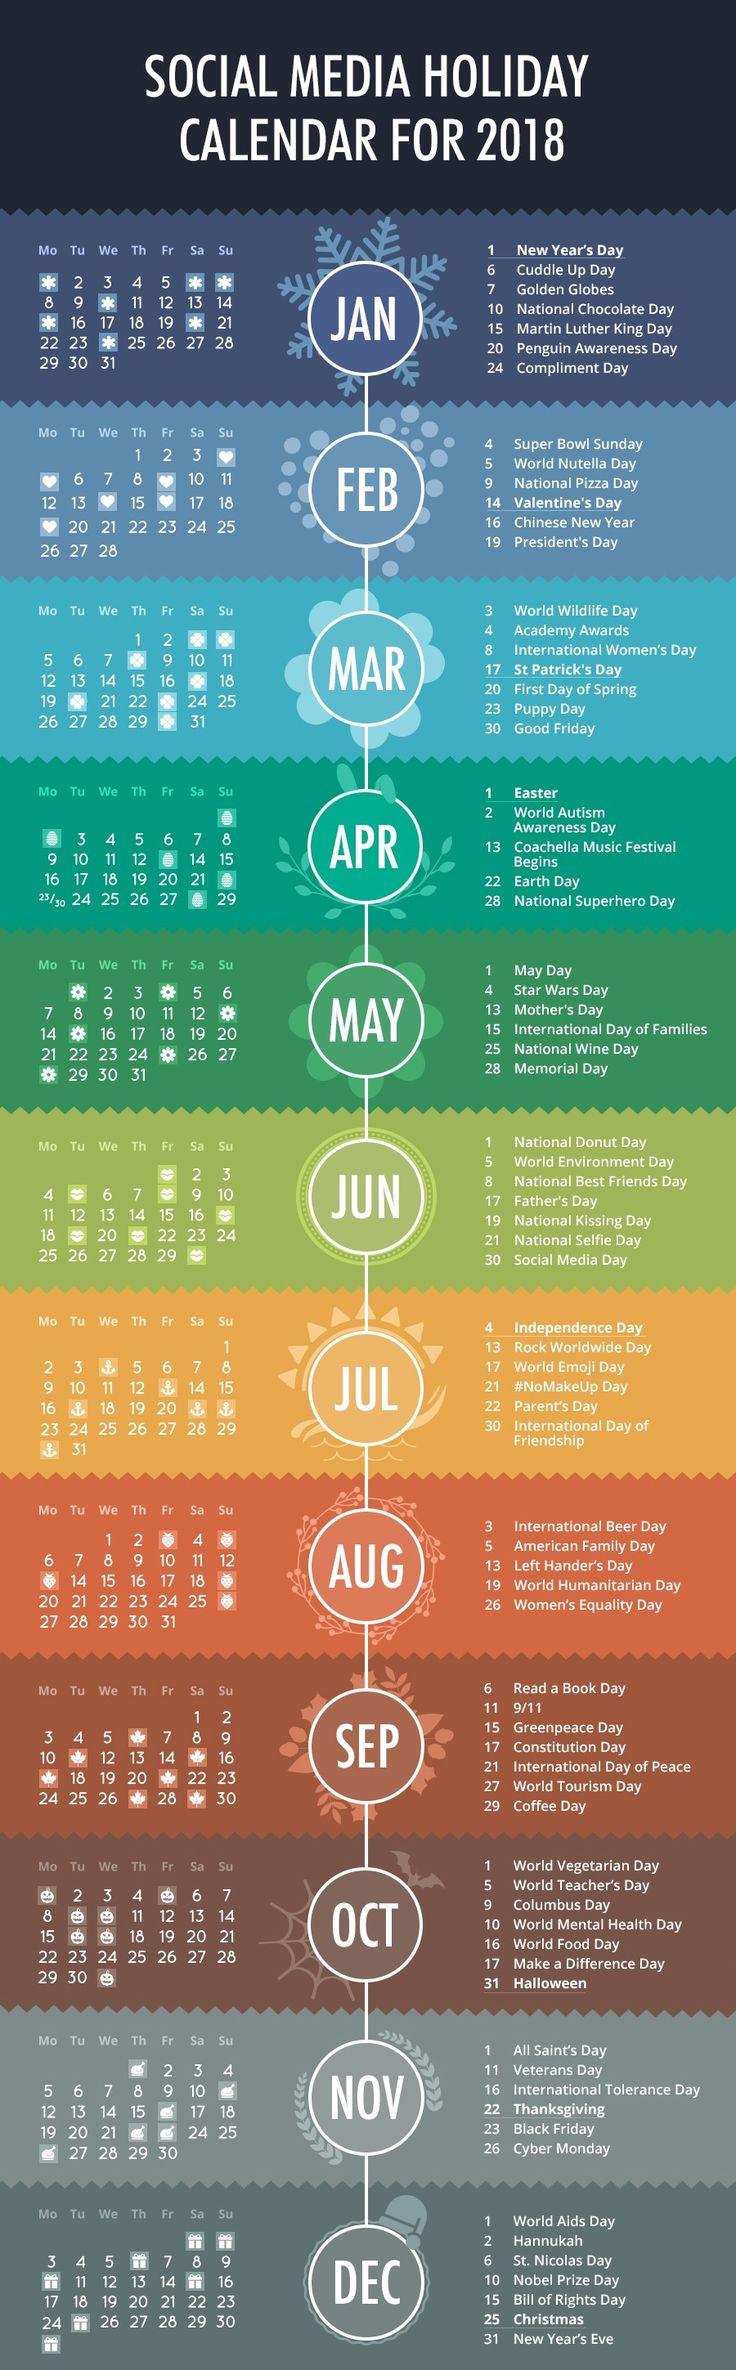 Best 25+ National holiday calendar ideas on Pinterest ...